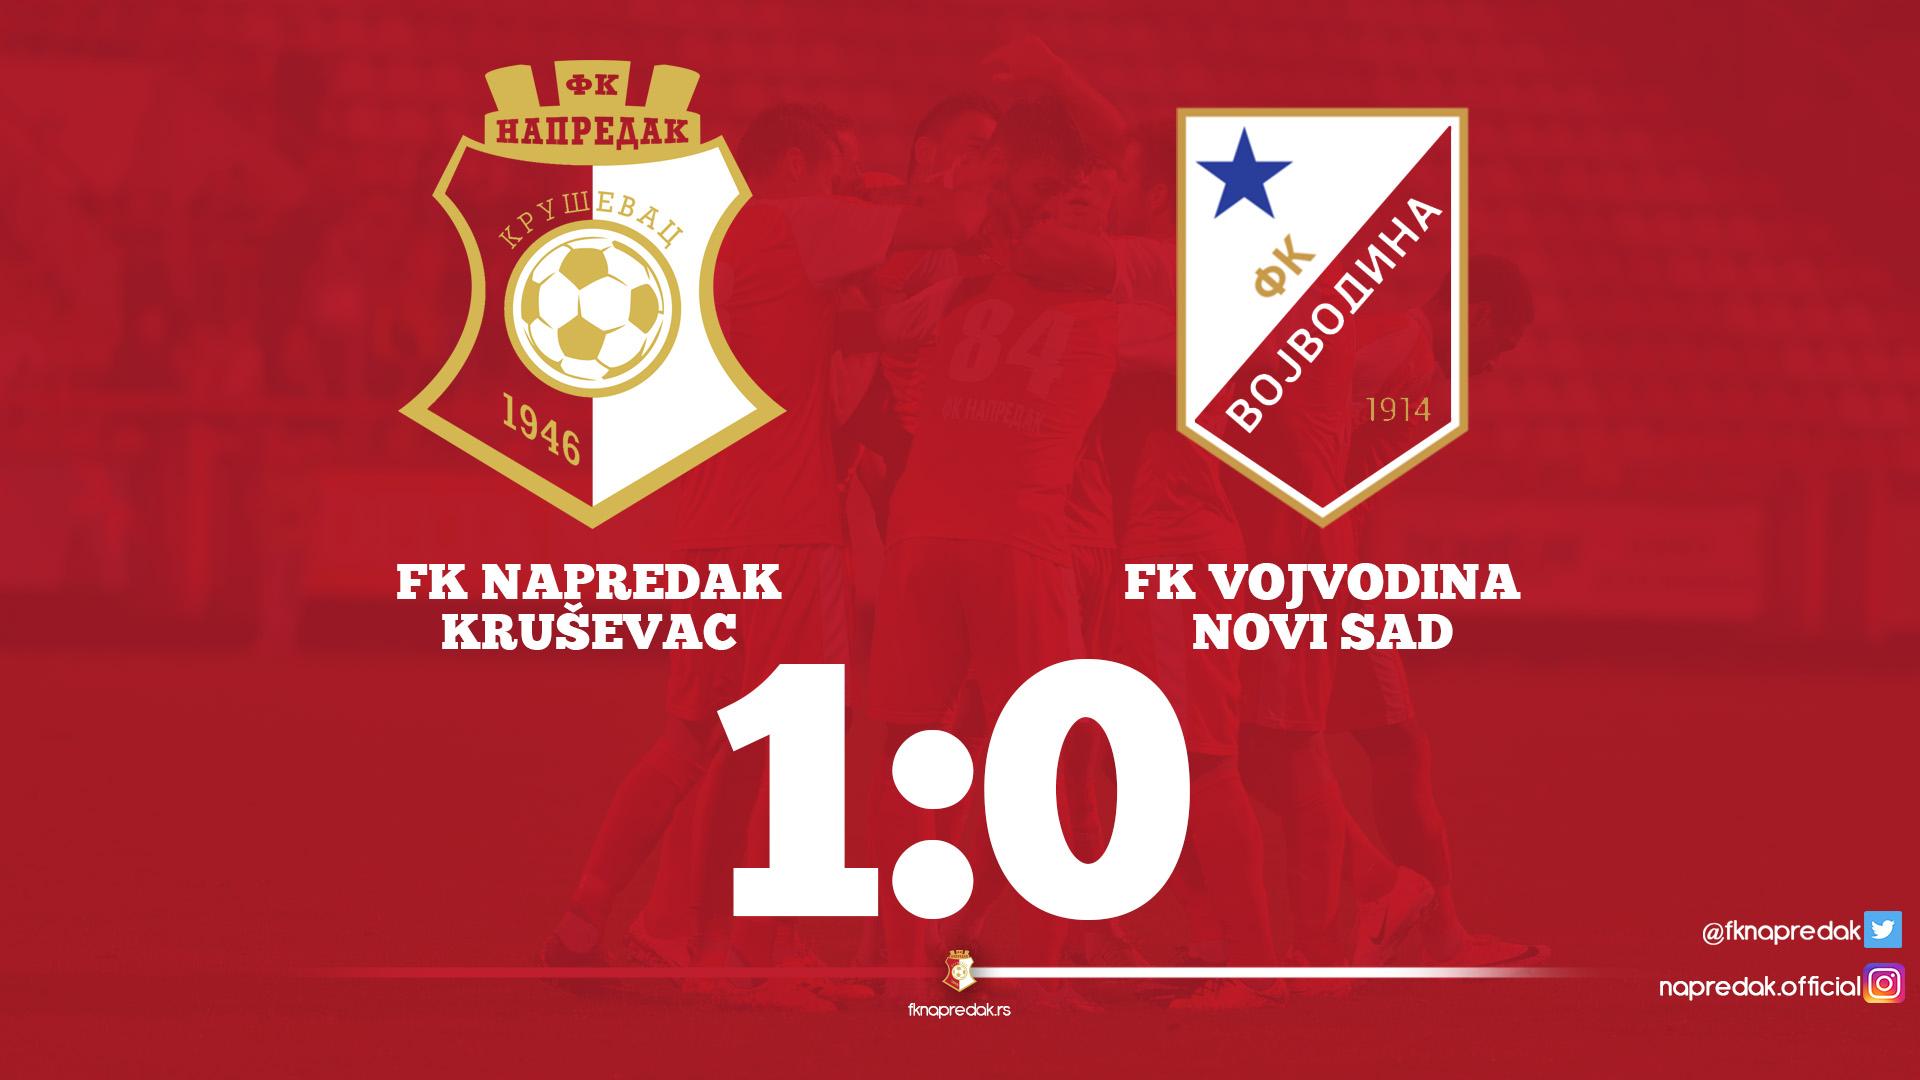 Napredak F.C - Vojvodina F.C 1:0